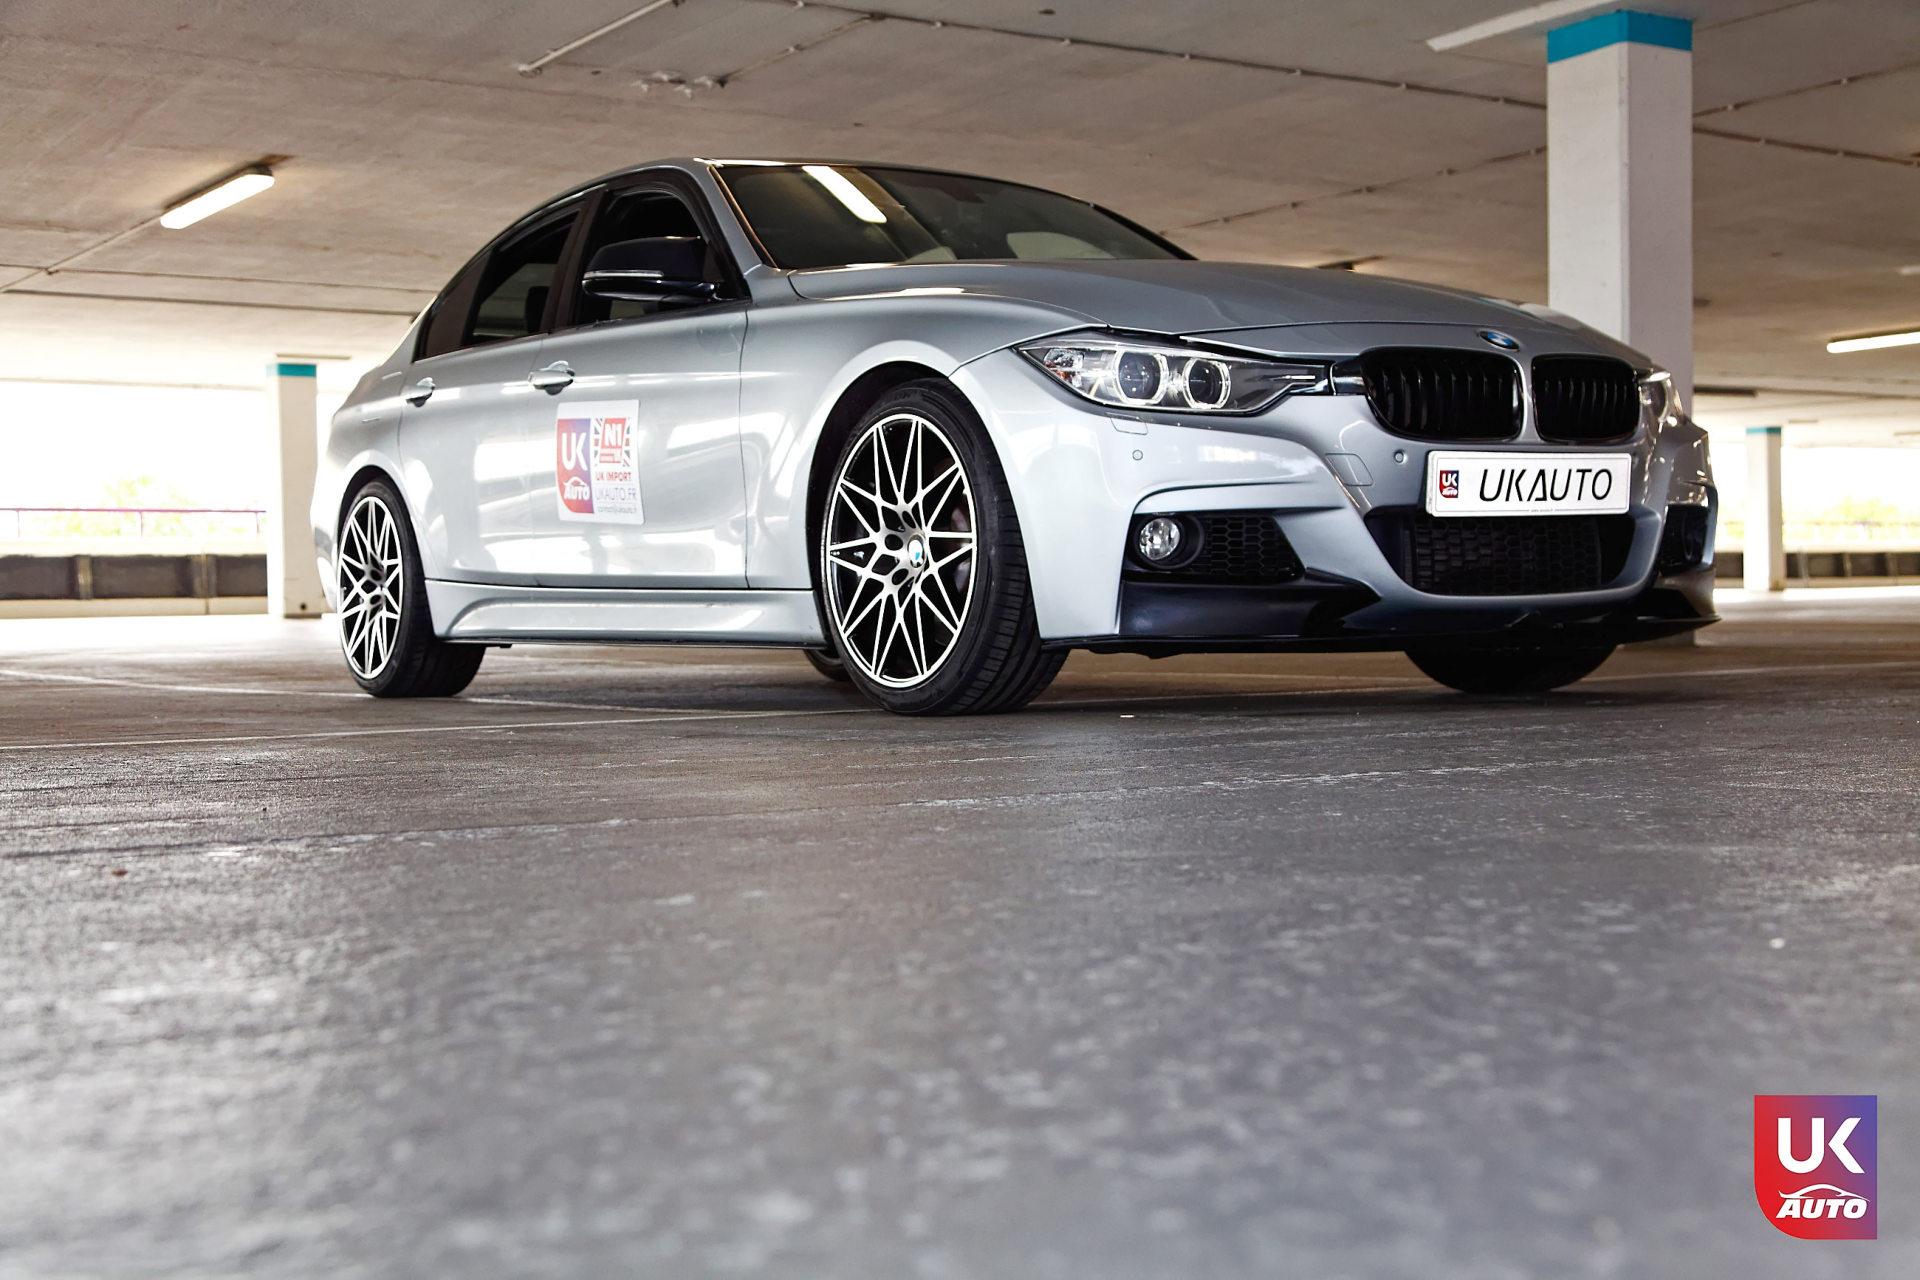 Bmw 335I IMPORT F30 eric drouet import bmw occasion rhd mandataire bmw angleterre10 DxO - IMPORTATION BMW 335 I FELICITATION A ERIC DROUET BMW VOITURE SPORTIVE UK